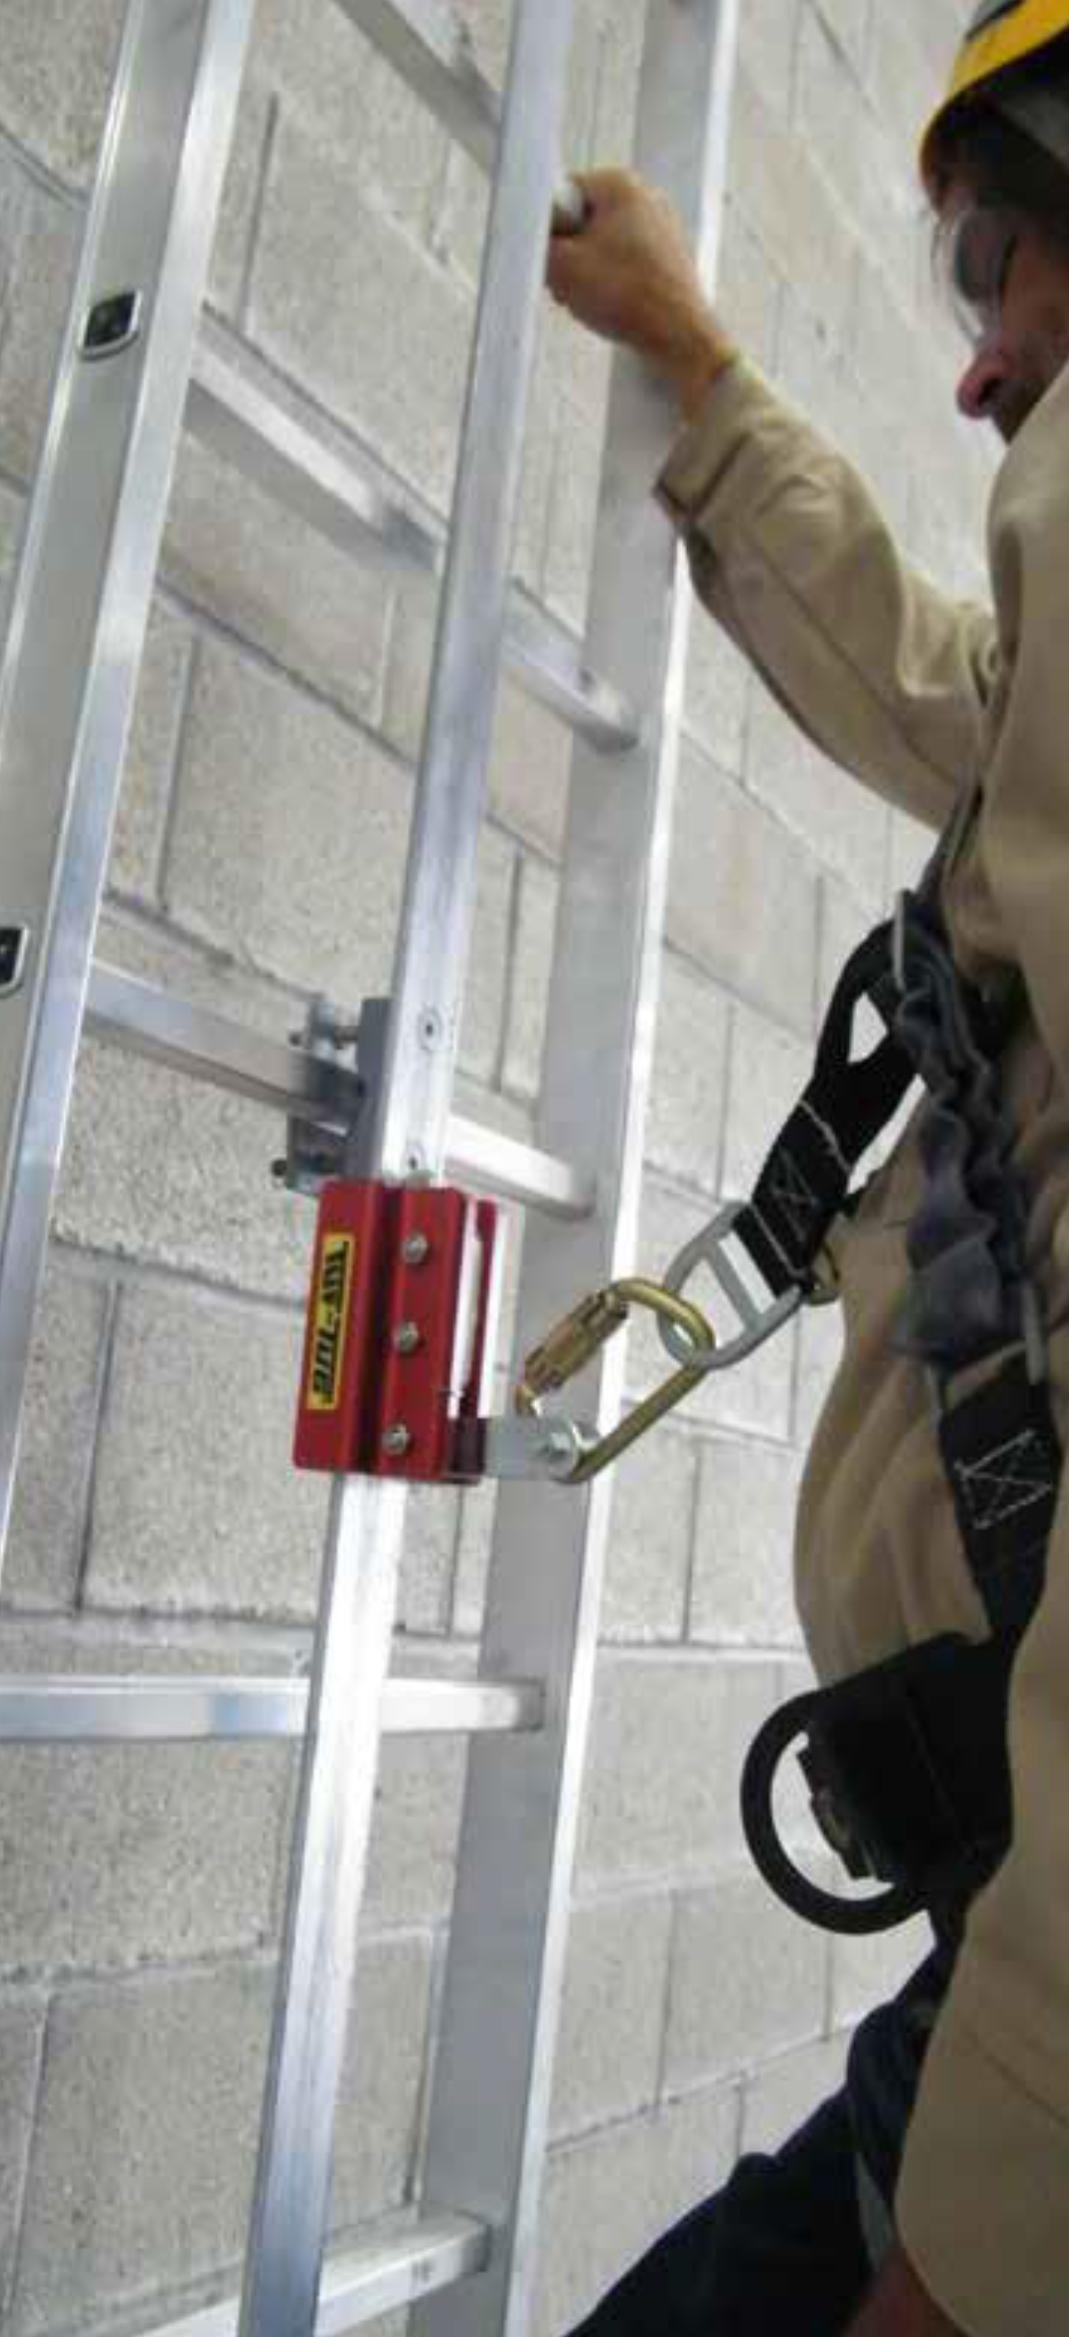 Wire Grab Fall Arrestor Model TT WG 500 | Tuf-Tug Products